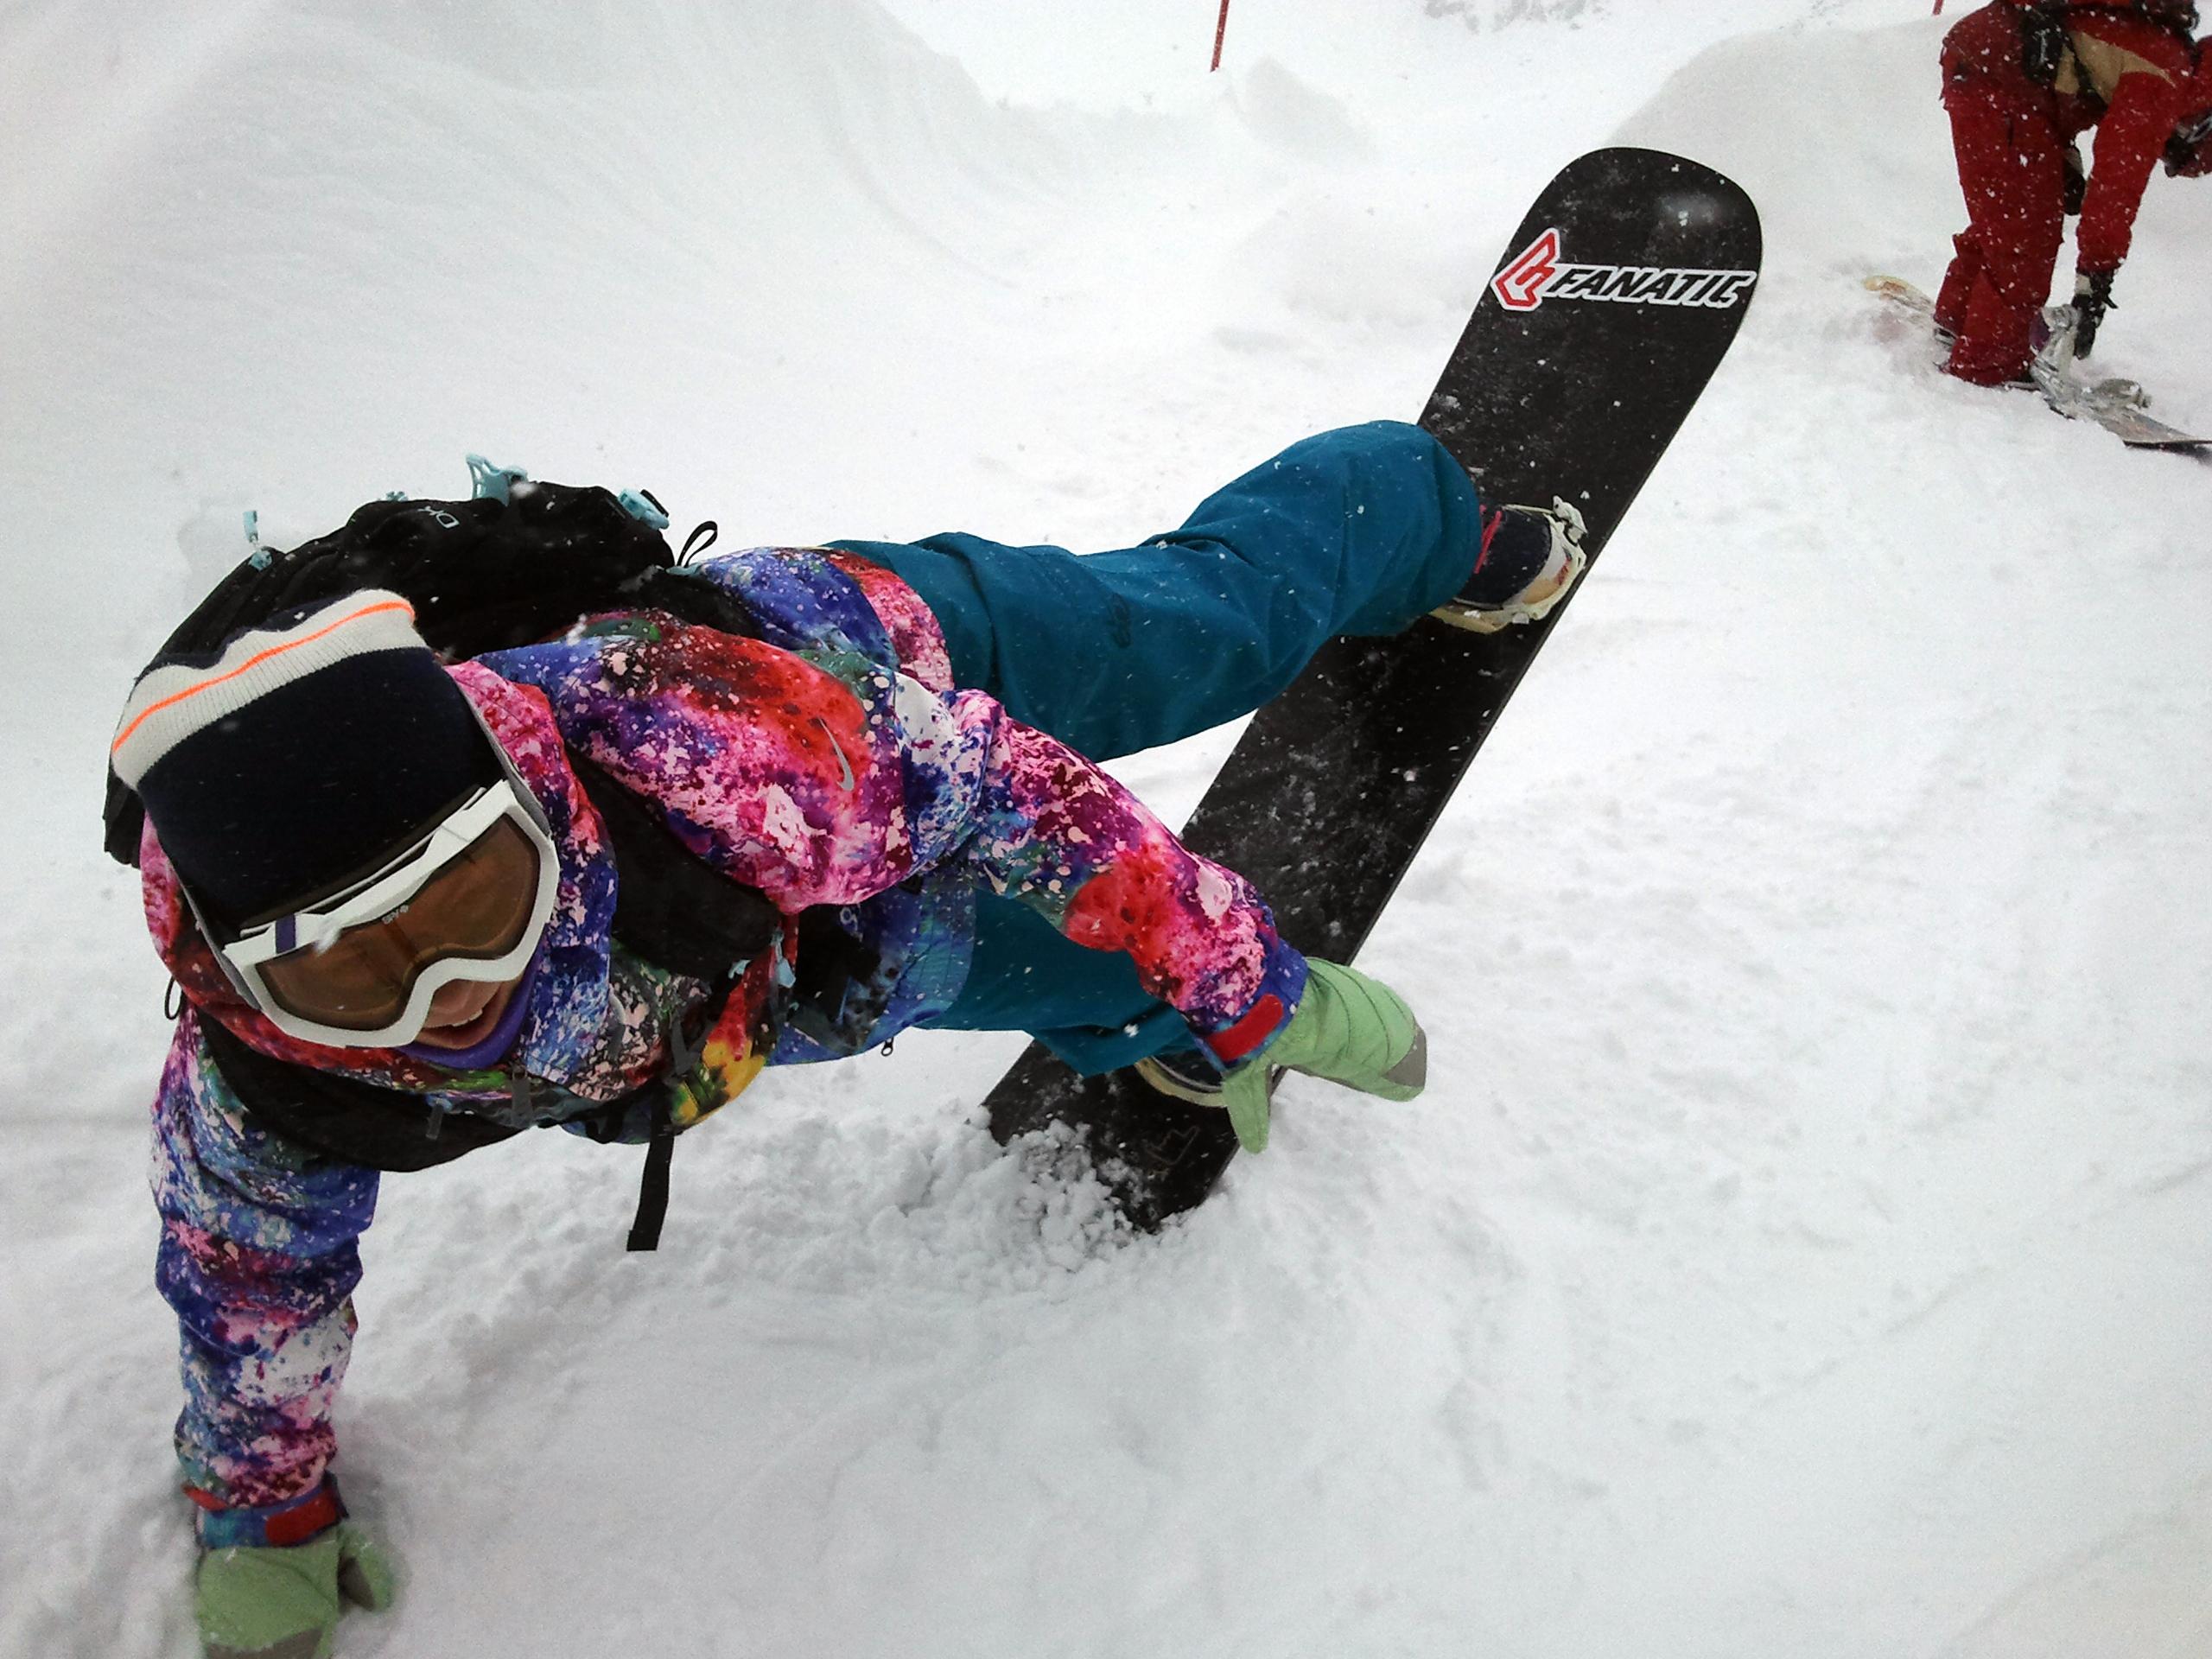 Fanatic snowboards